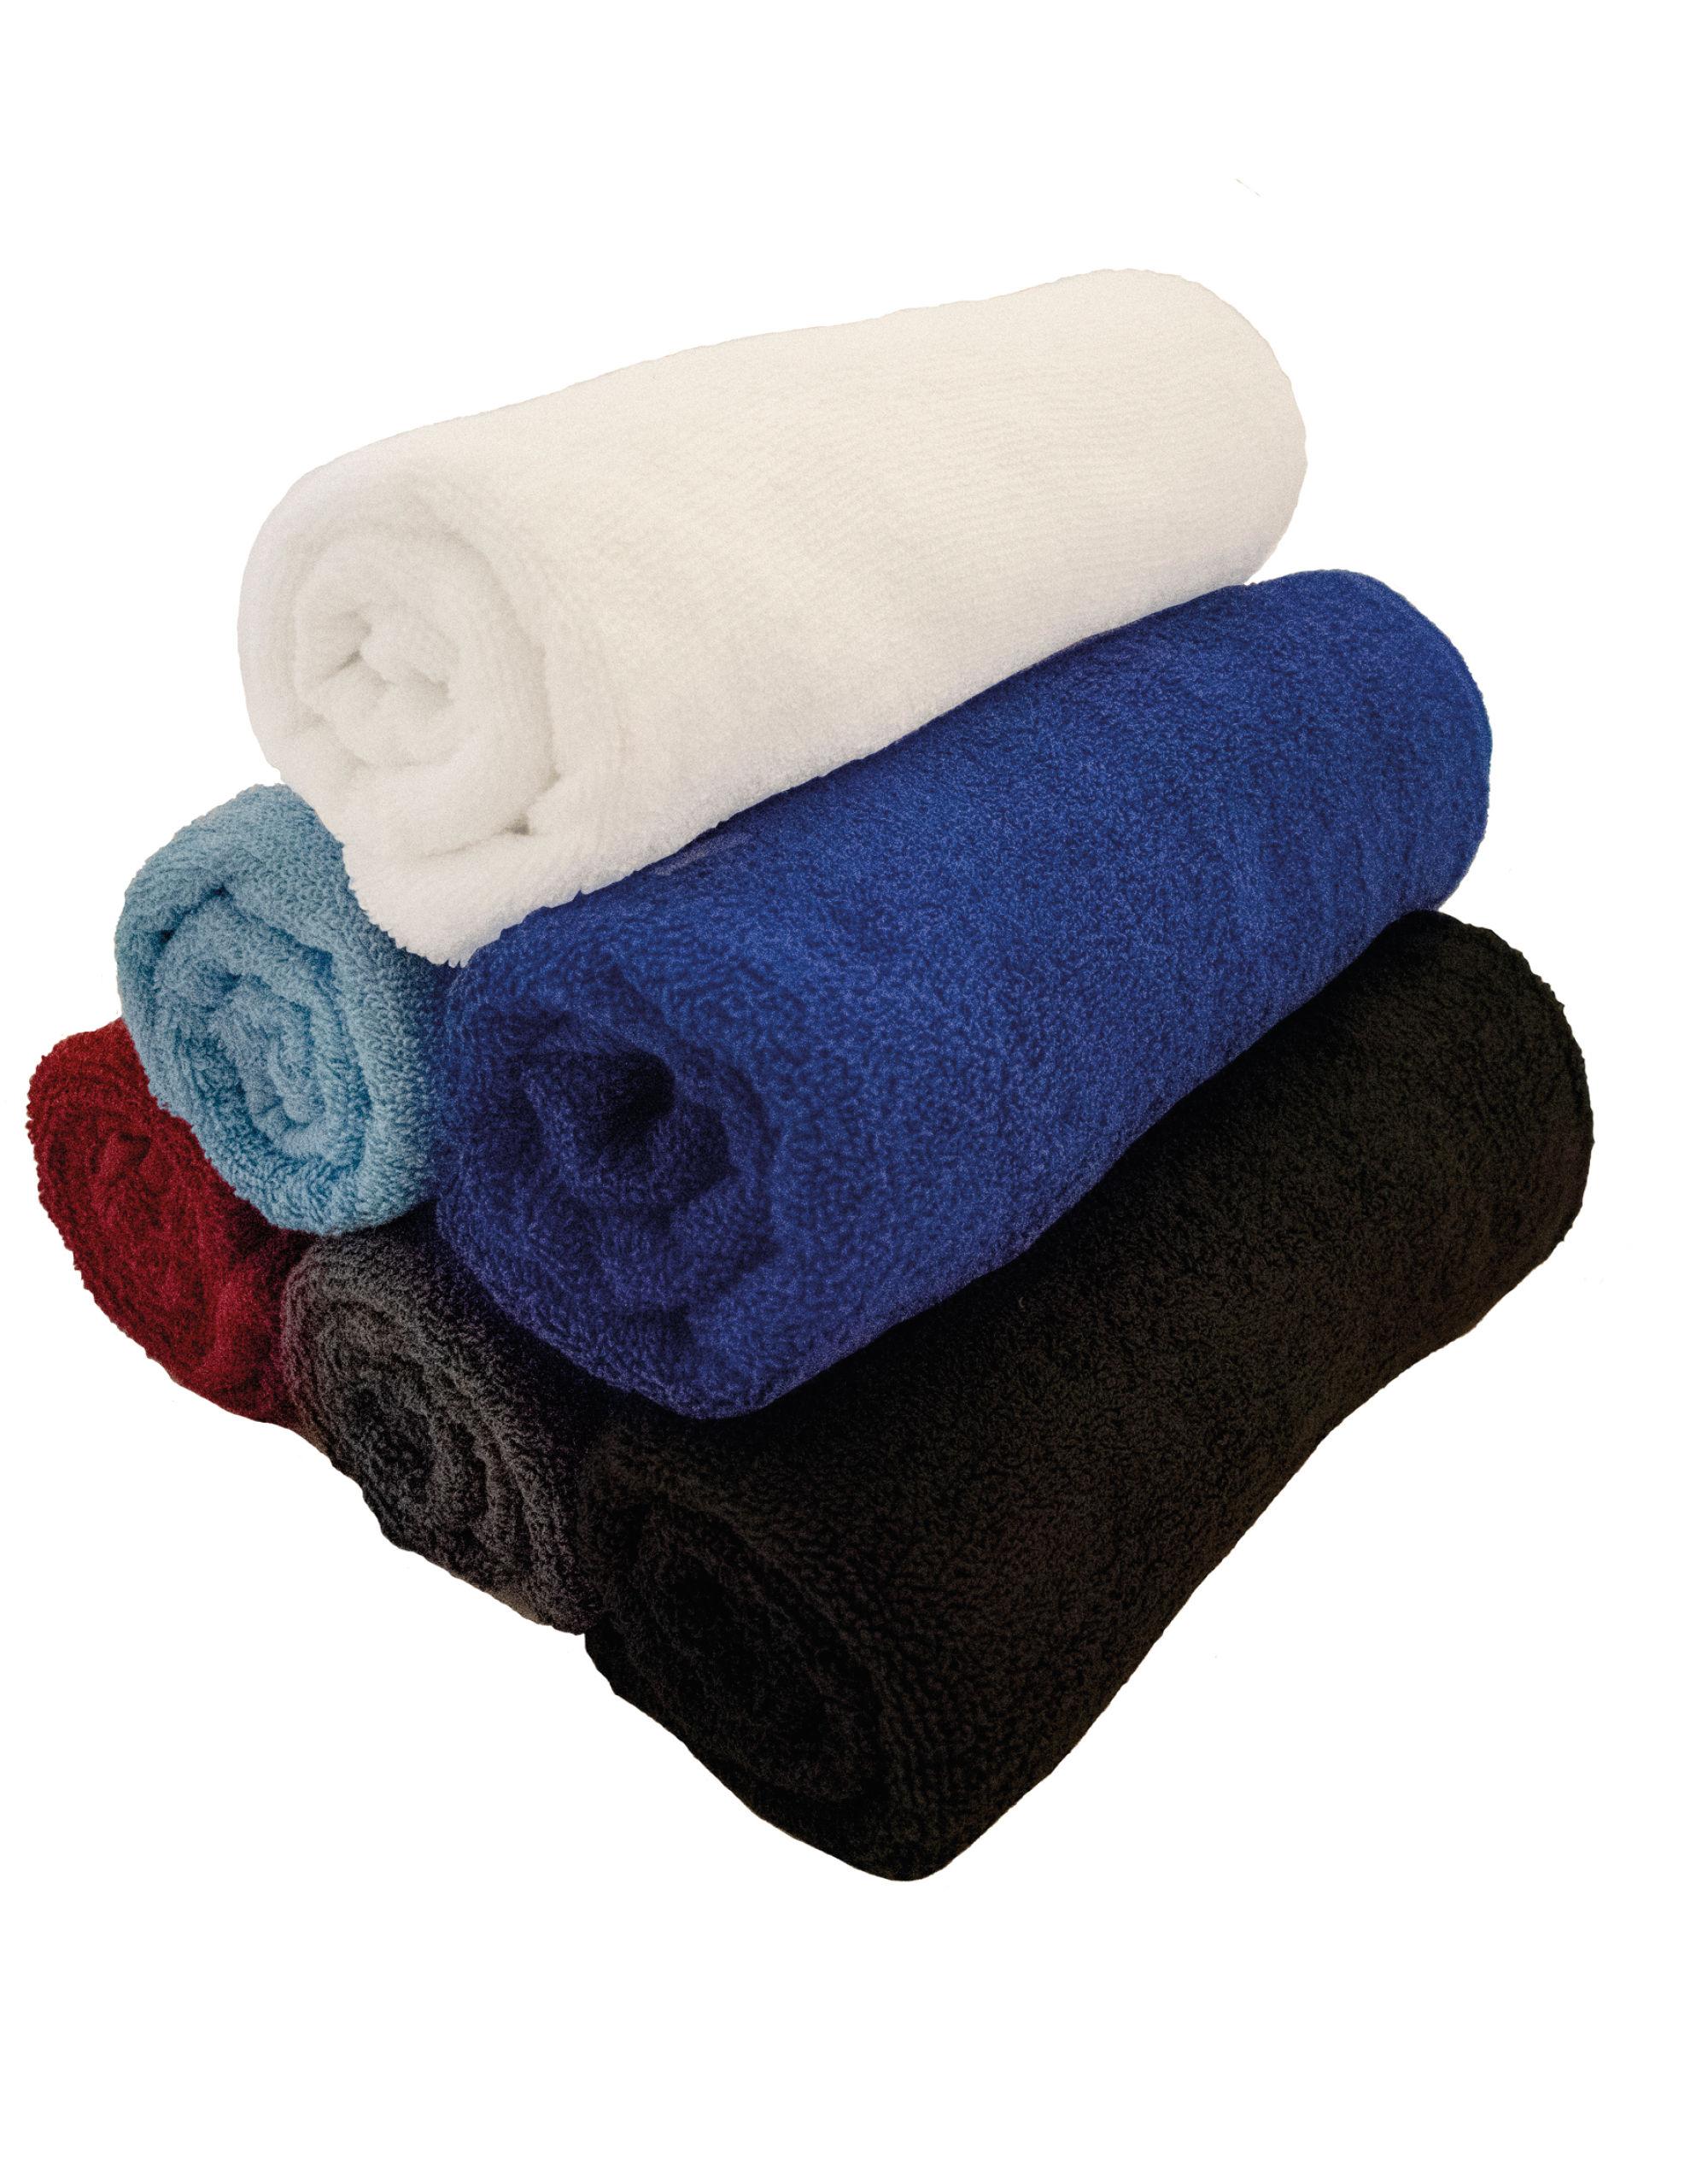 Towels By Jassz Ebro Hand Towel 50x100cm